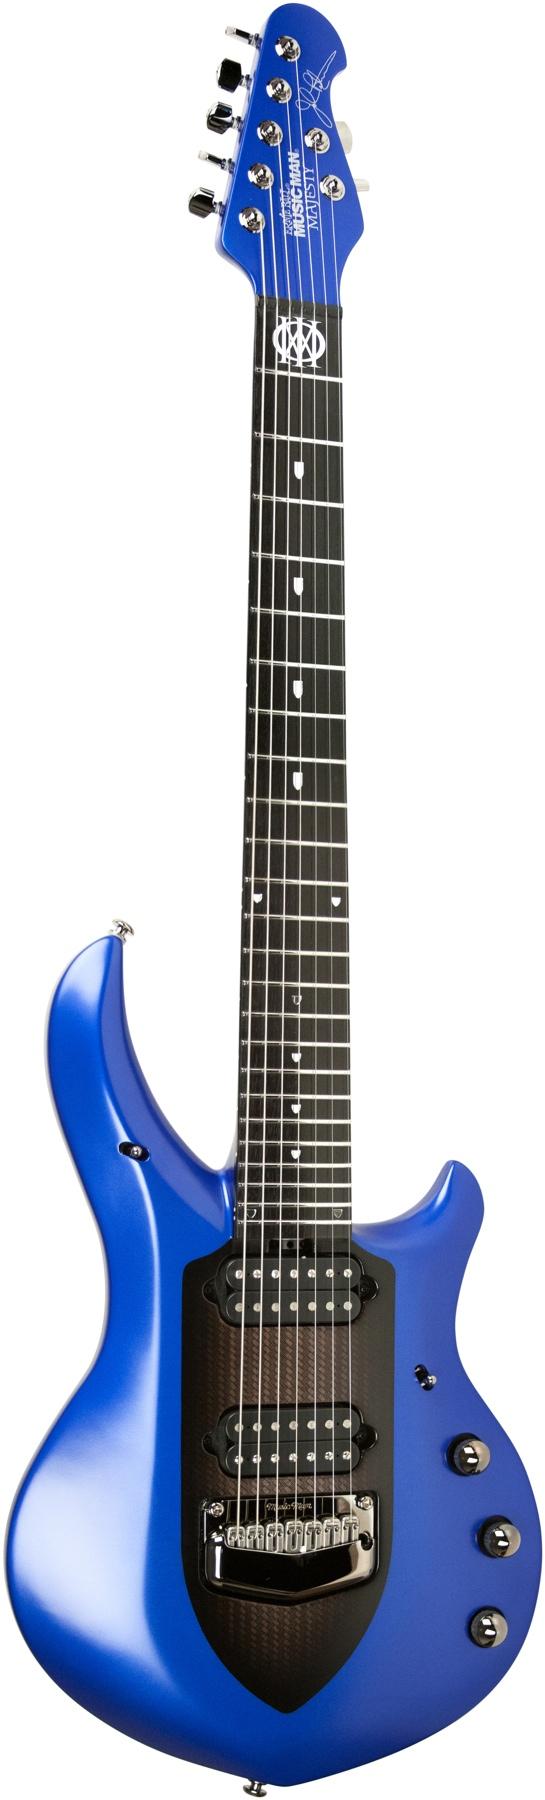 Ernie Ball Music Man Jason Richardson Signature Cutlass Hh Electric Guitar Natural Buckeye Burl Music Guitar Guitar Electric Guitar